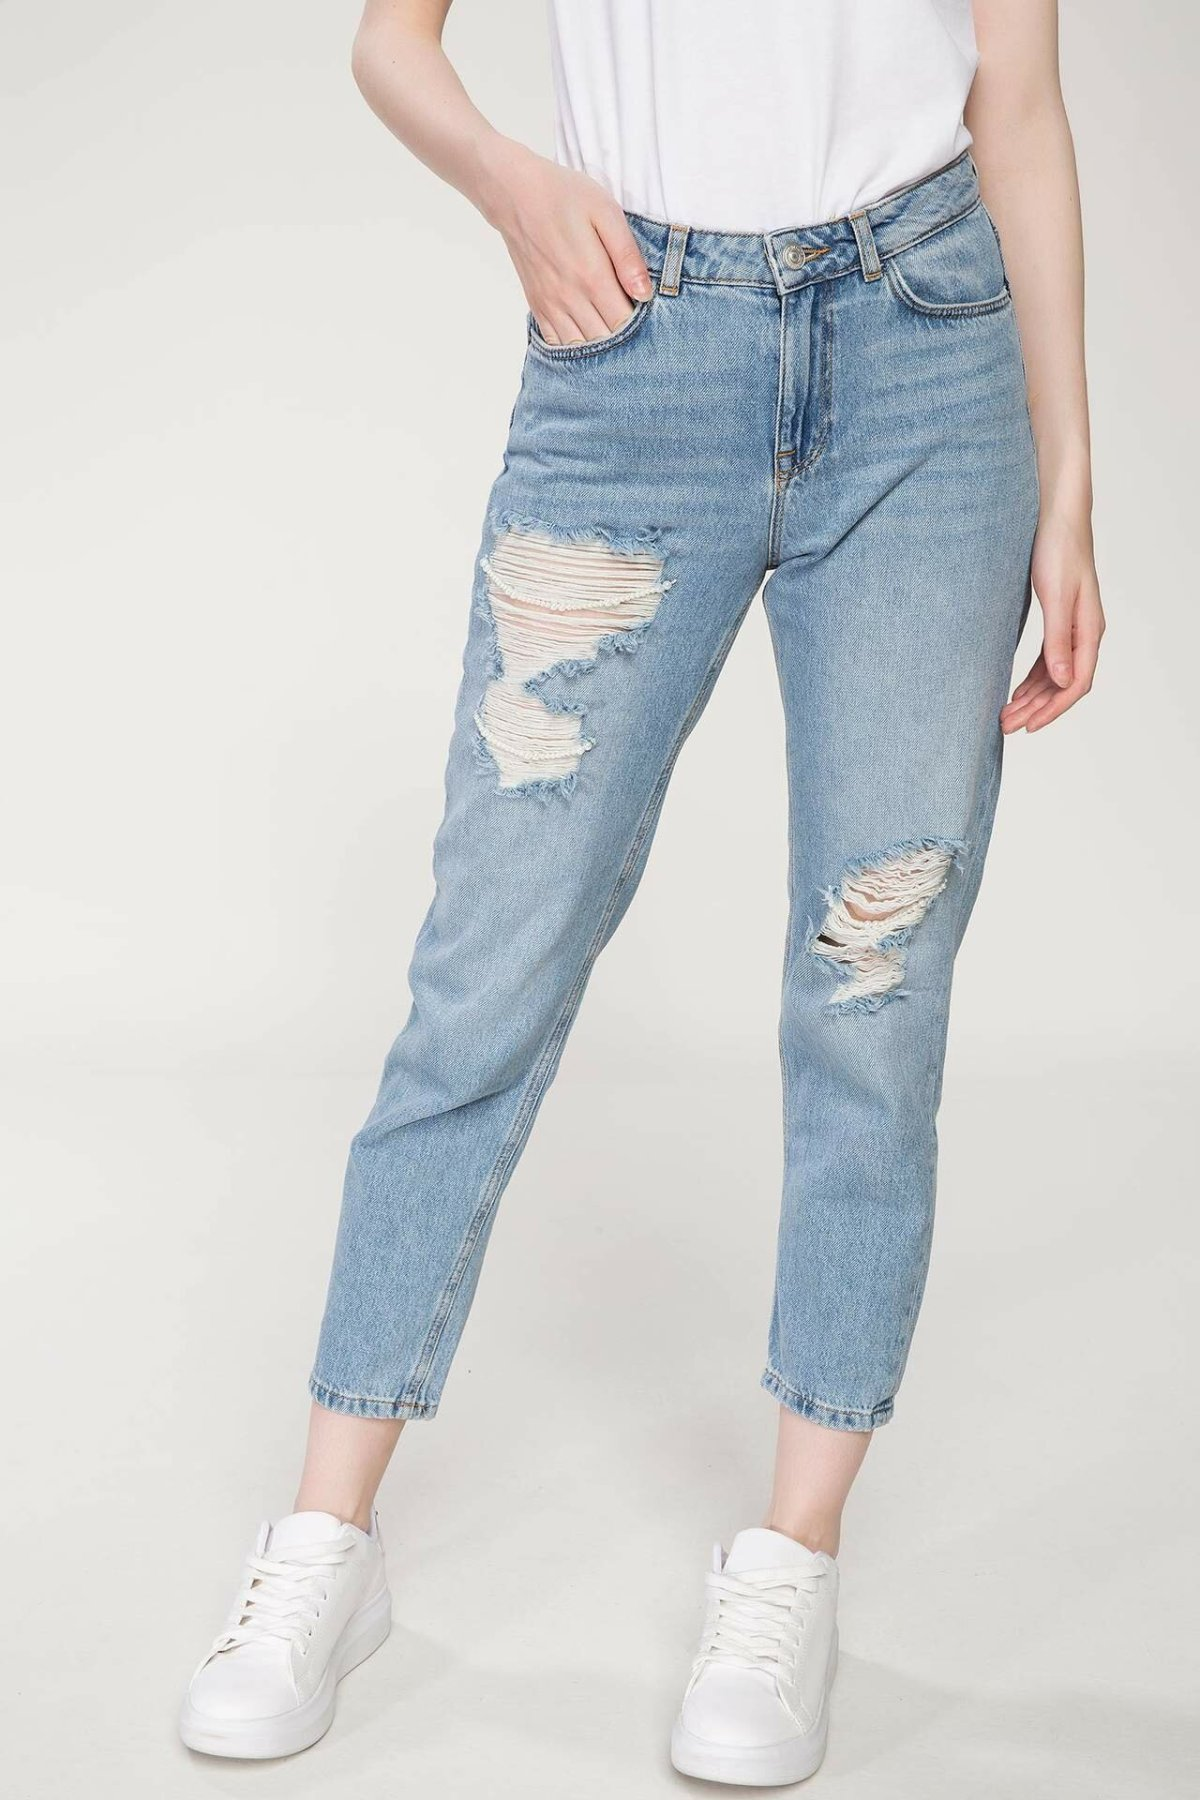 DeFacto Woman Summer Stylish Denim Jeans Women Ripped Holes Ninth Denims Female Casual Light Blue Denim Trousers-J2424AZ18SM